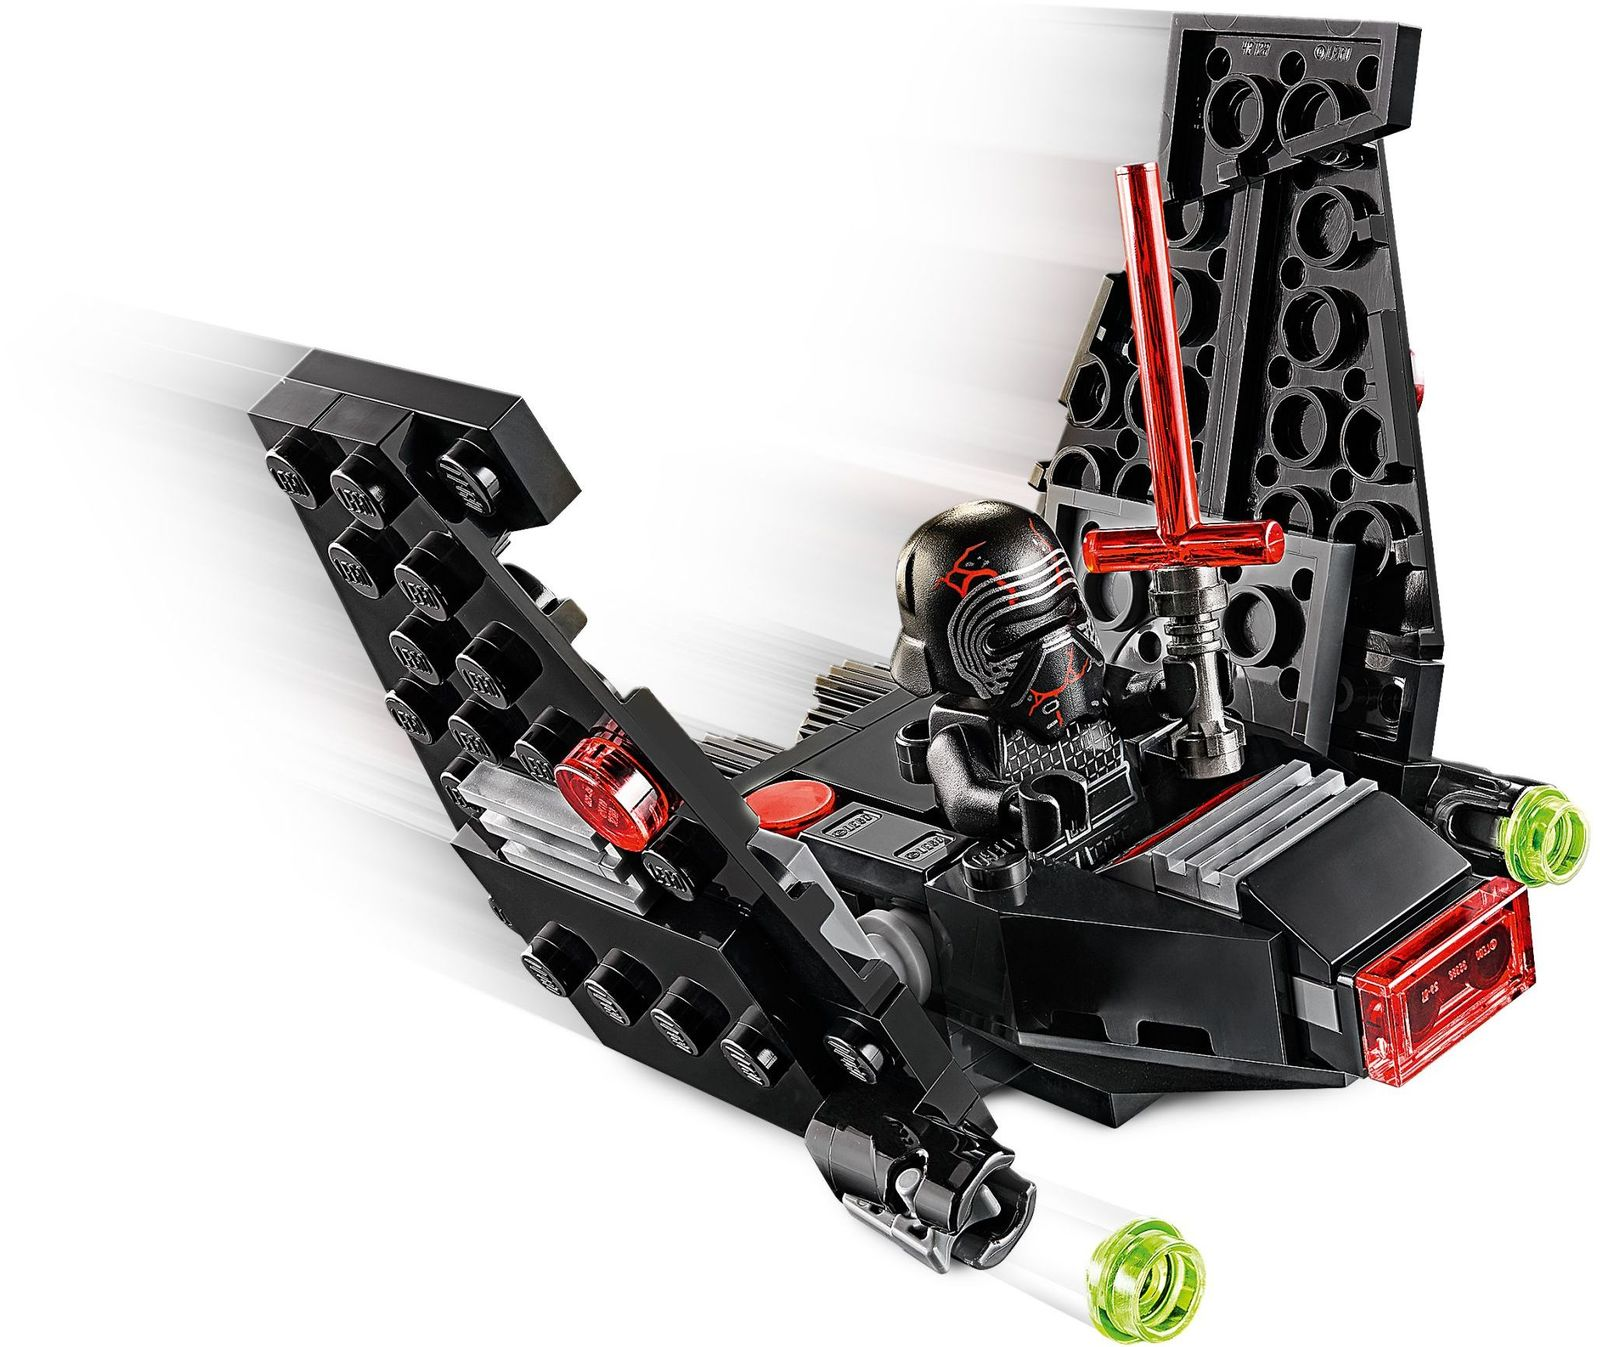 LEGO: Star Wars - Kylo Ren's Shuttle image